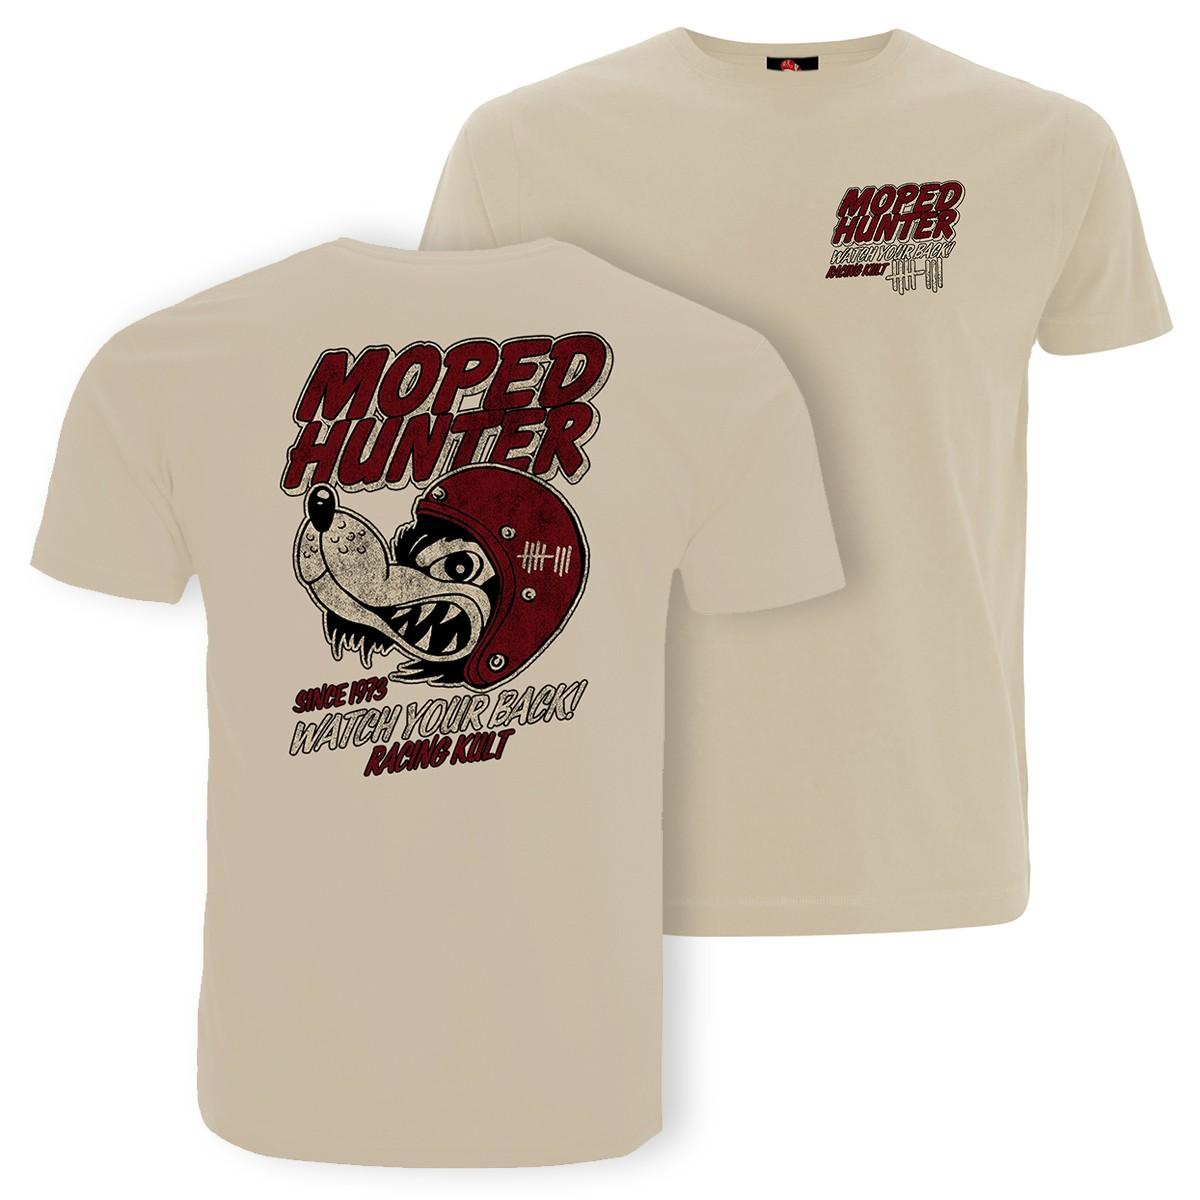 Racing Kult T-Shirt Moped Hunter